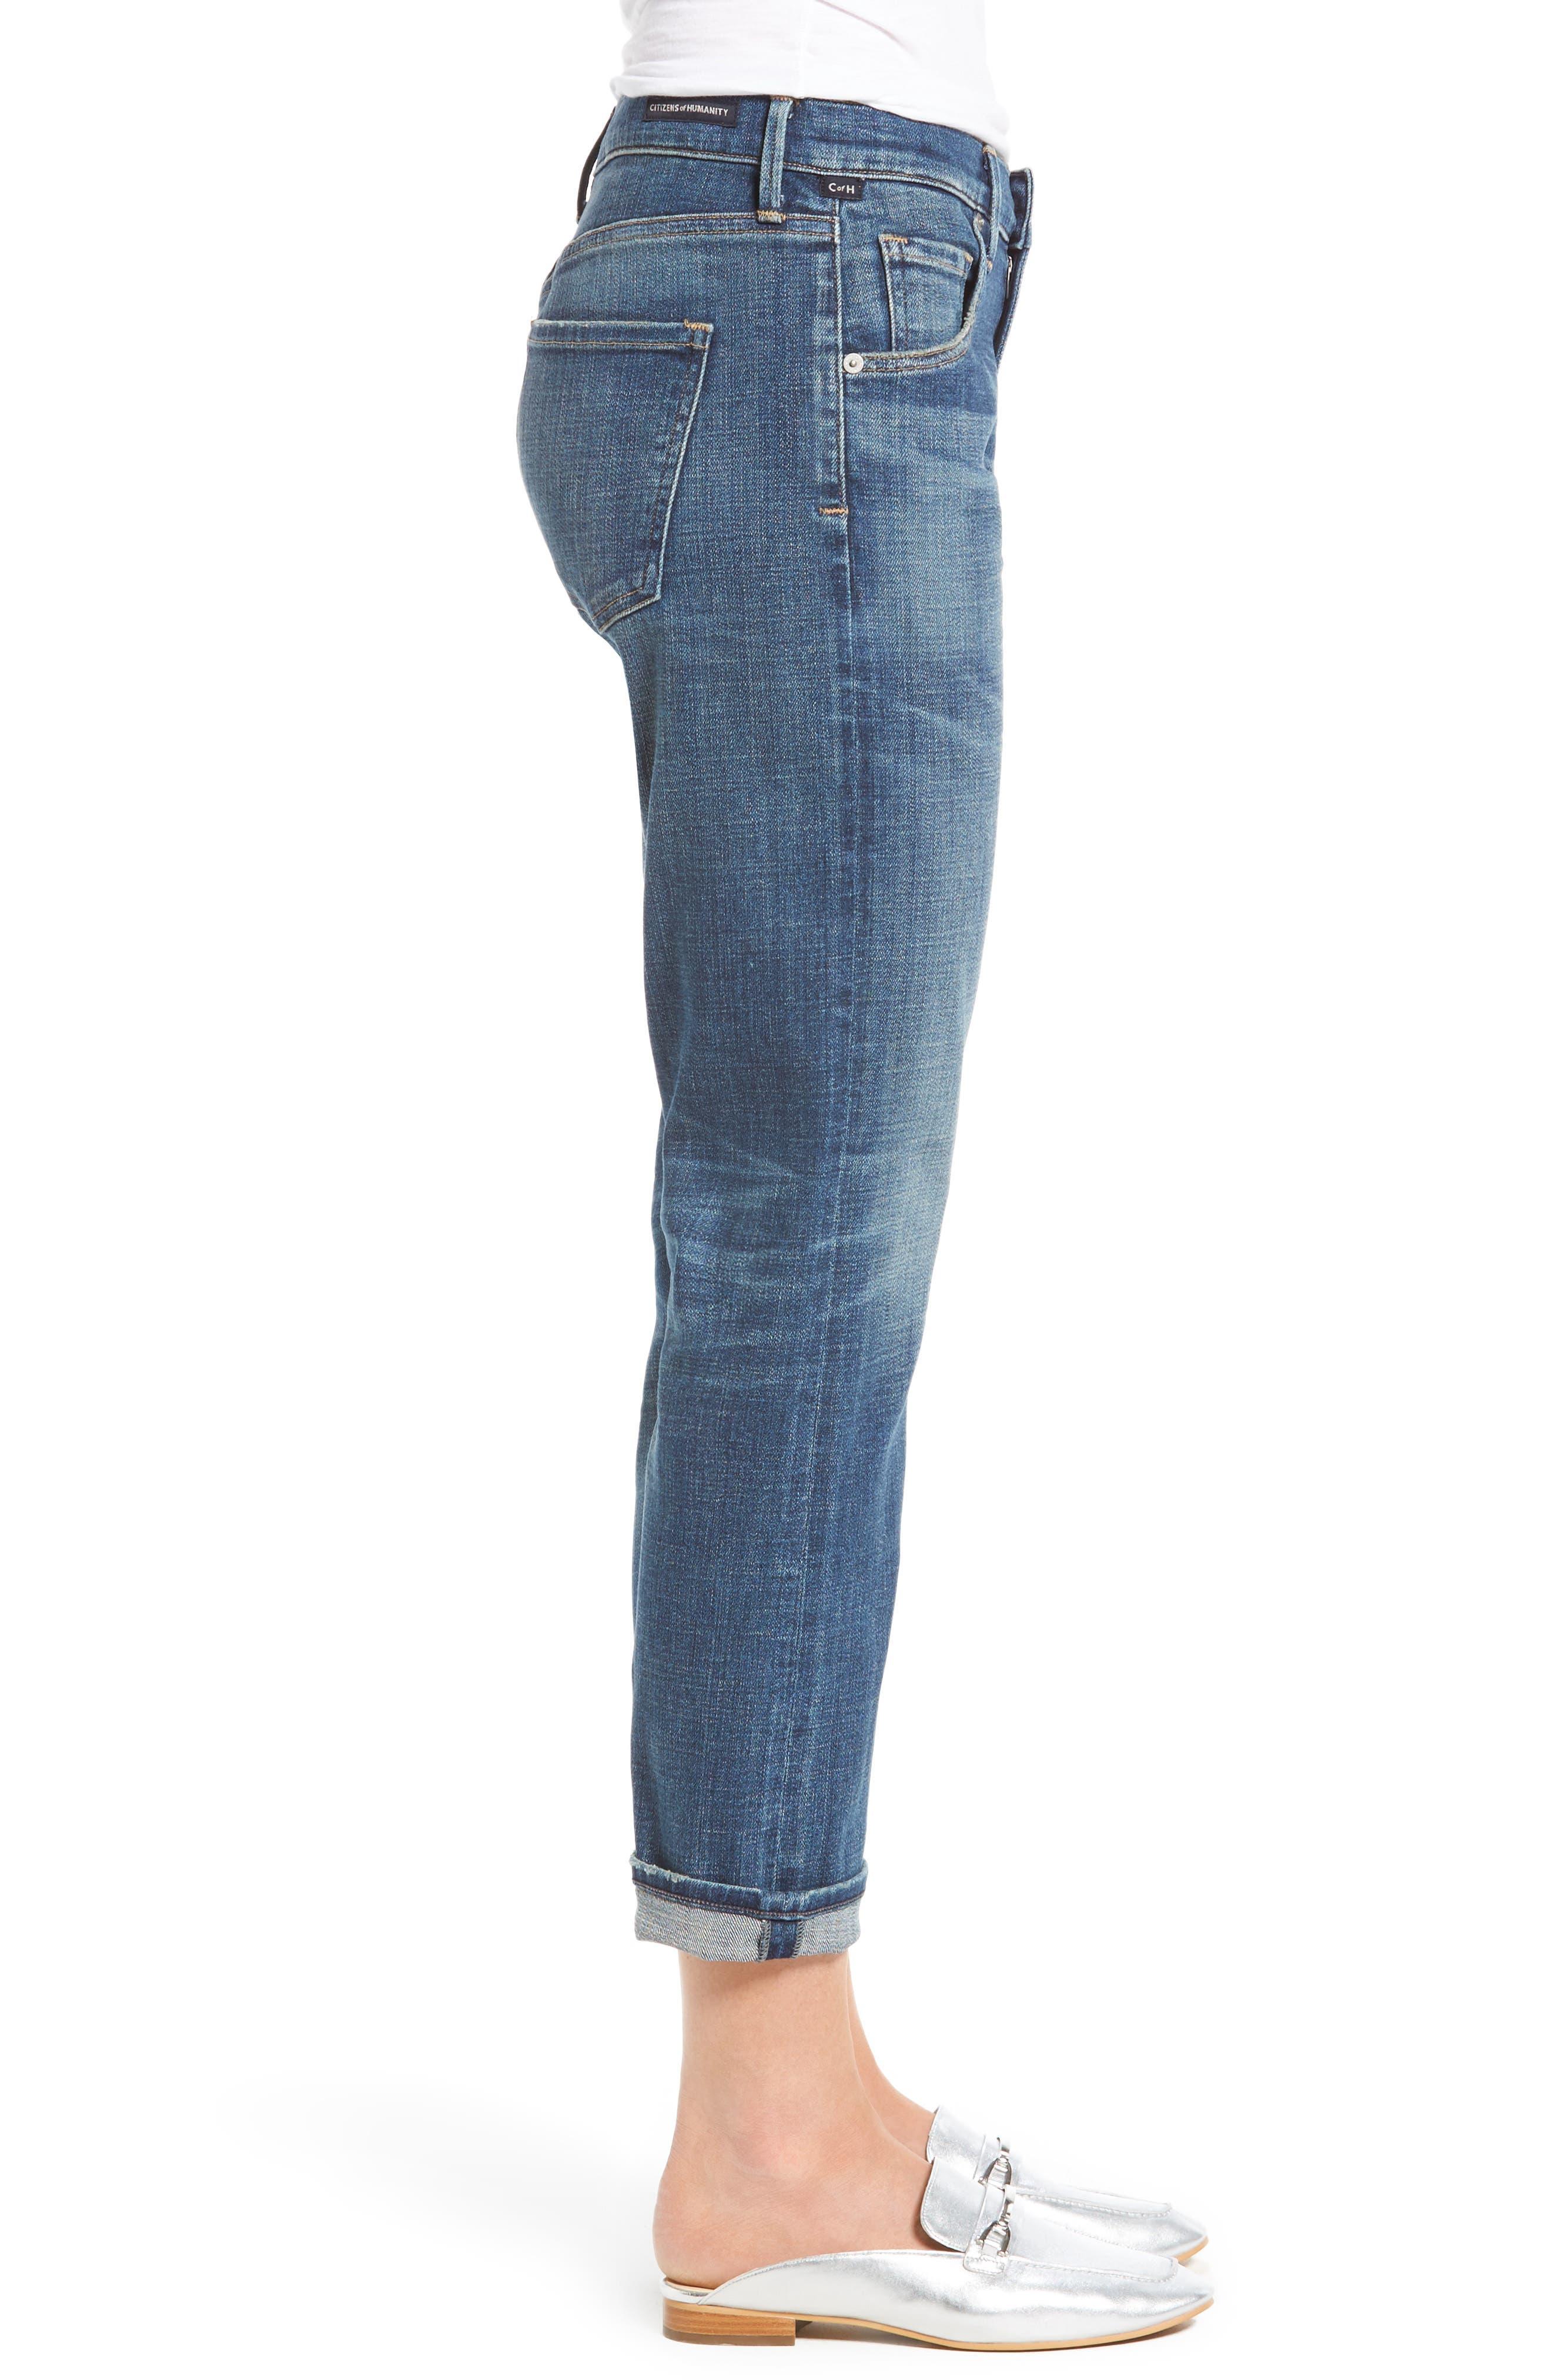 Alternate Image 3  - Citizens of Humanity Emerson Slim Boyfriend Jeans (Crusade)